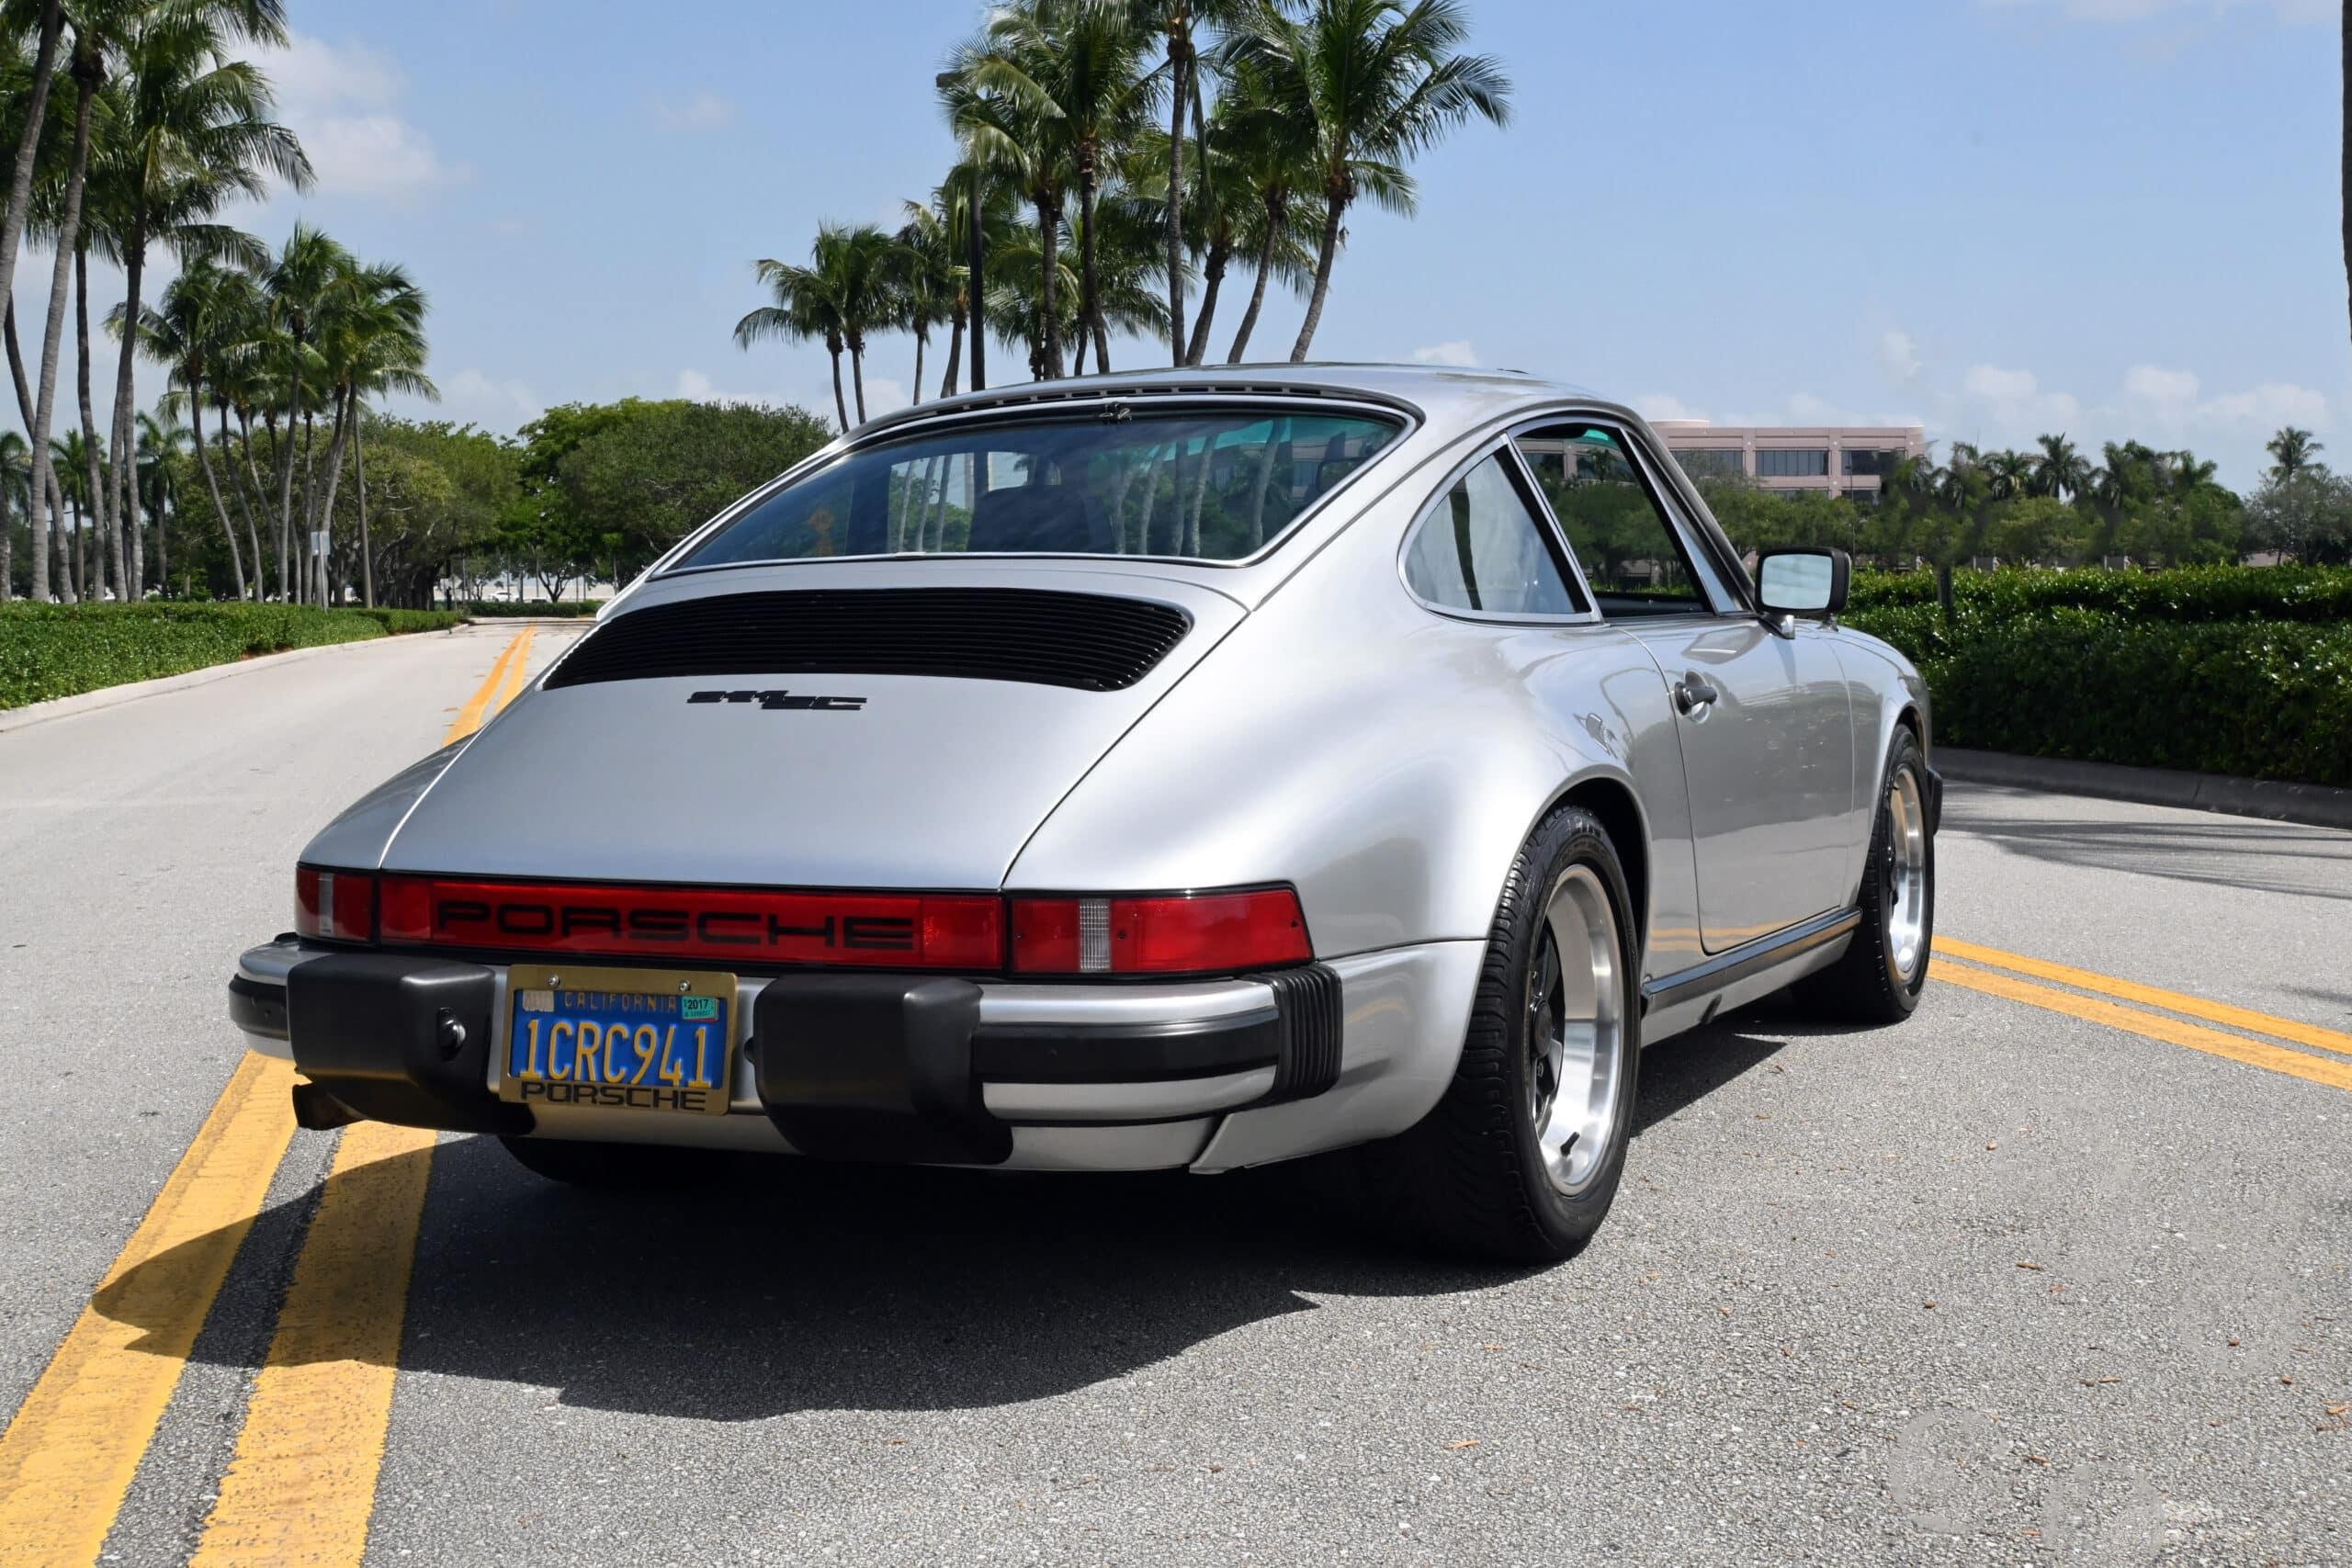 1979 Porsche 911 SC, only 79K miles since new, California car, 930 Turbo Fuchs, Desirable Silver Metallic, Rust Free